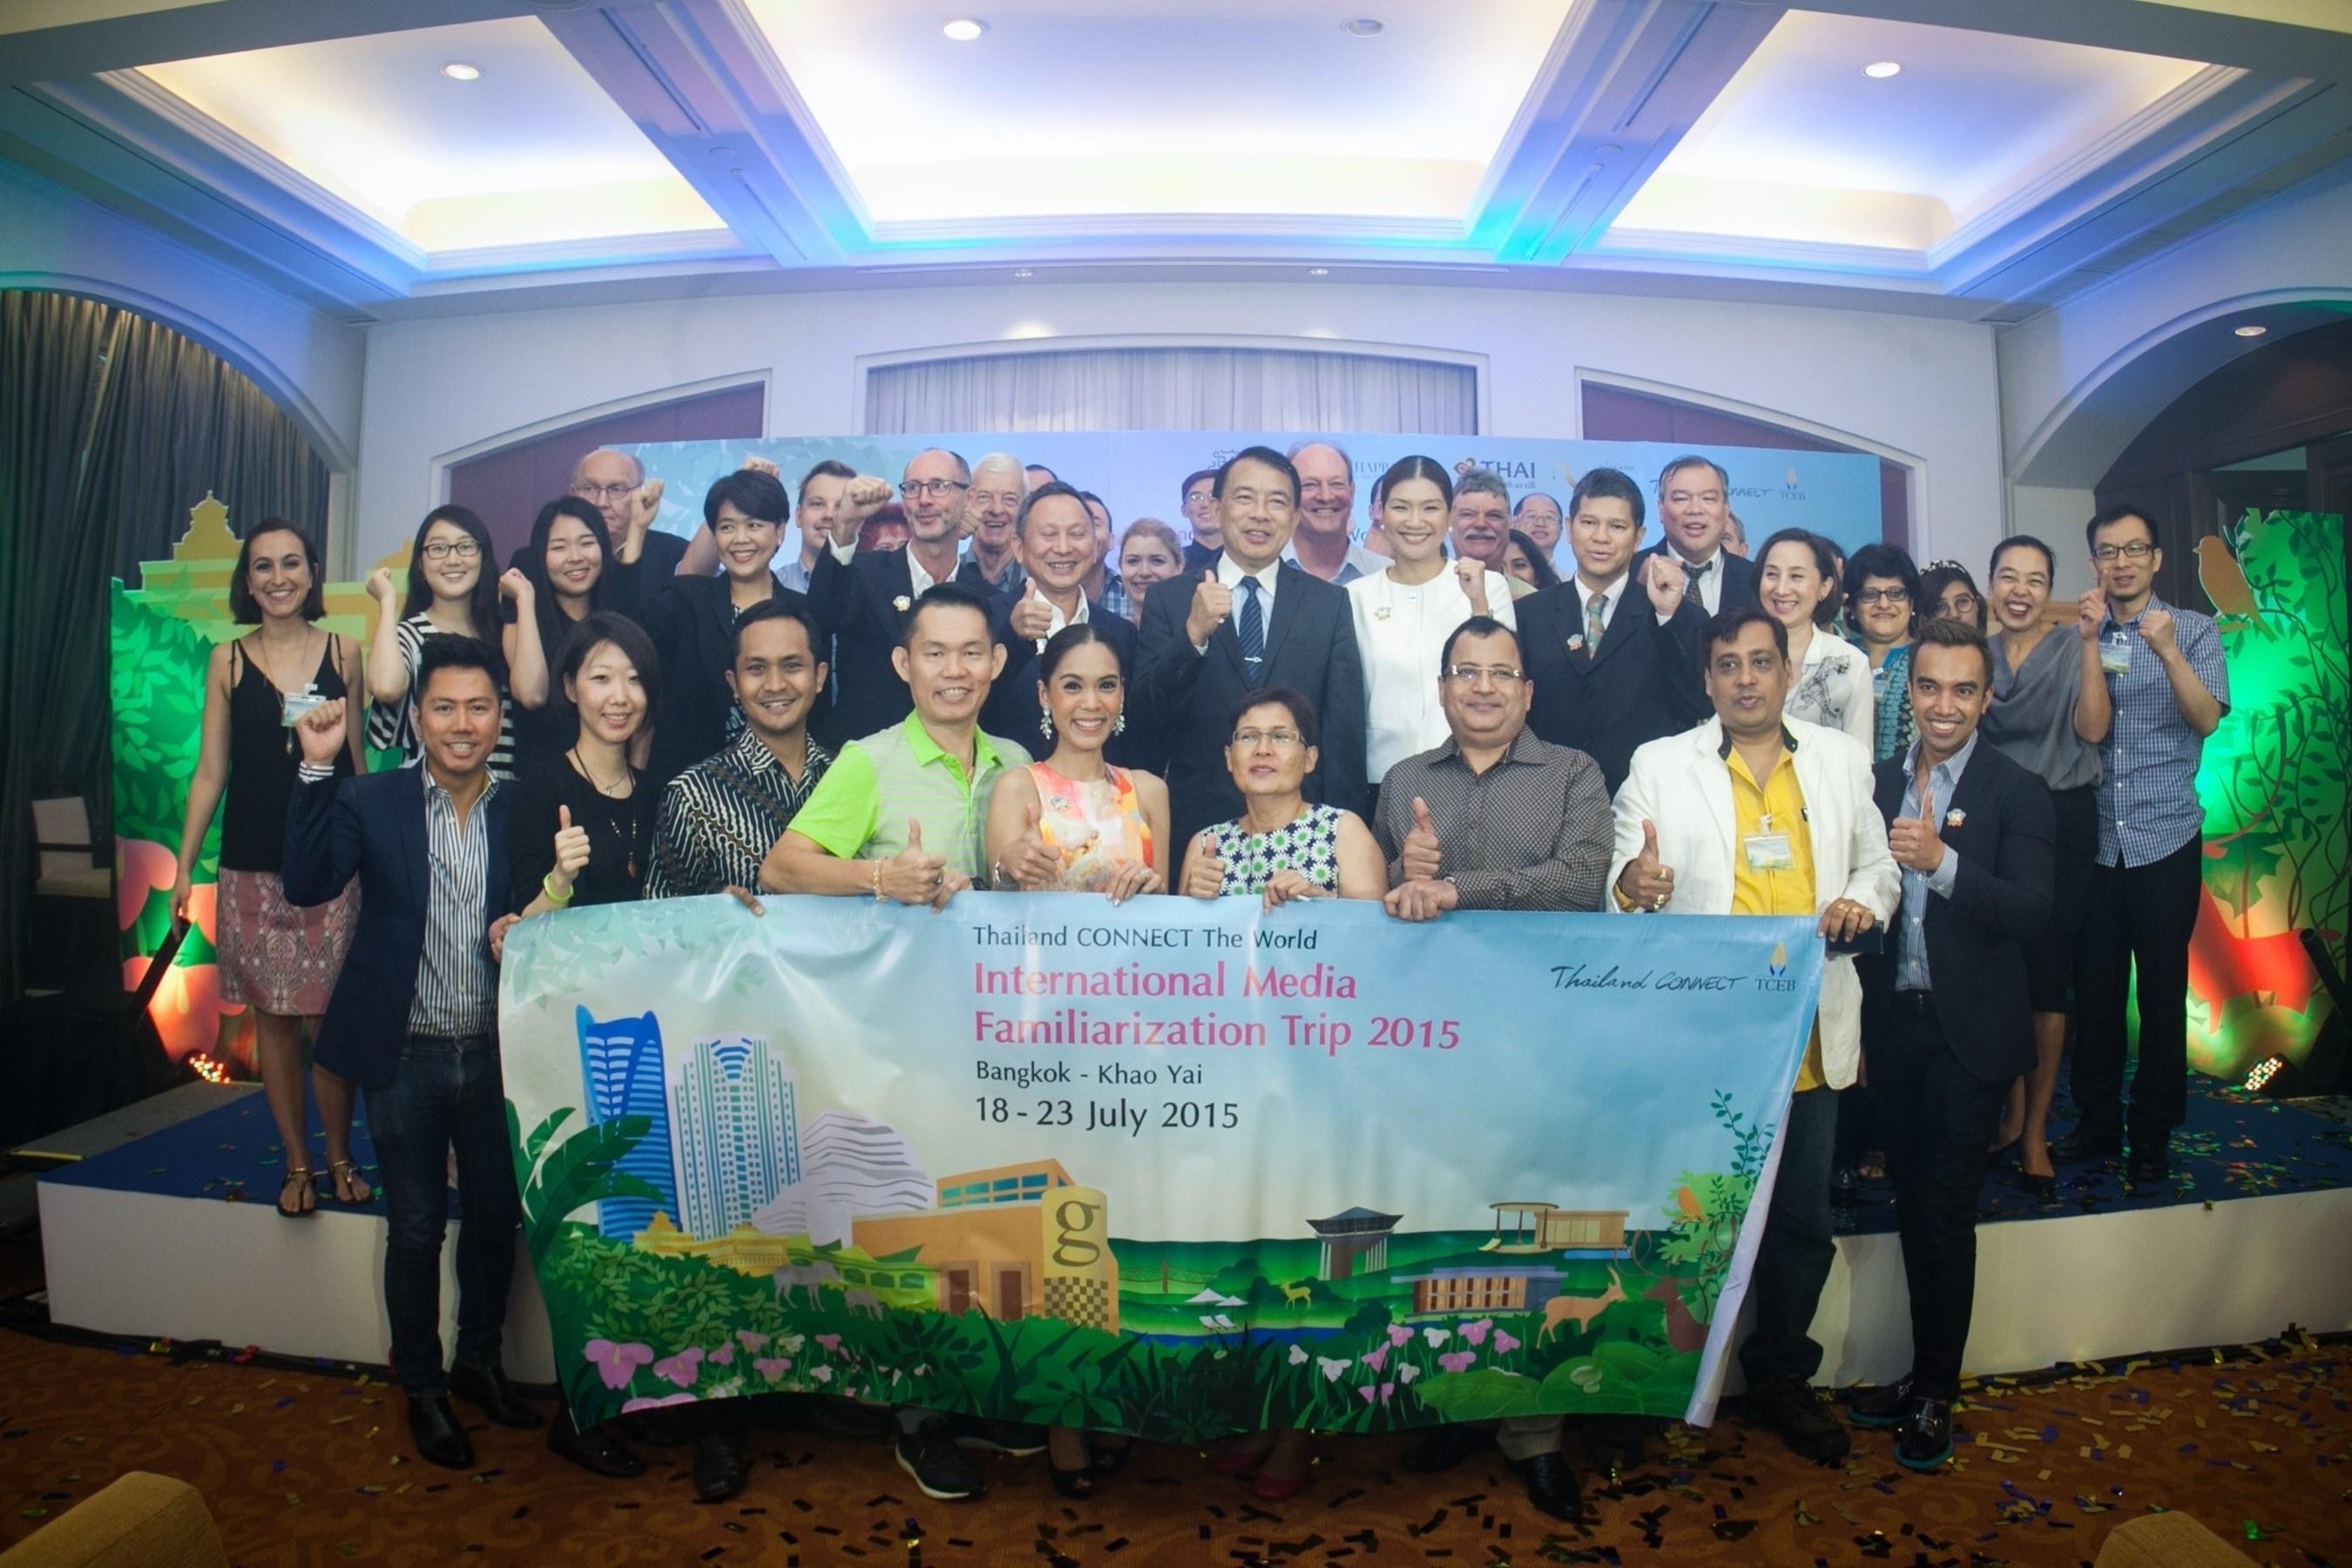 TCEB Accelerates ASEAN Success Through Thailand CONNECT The World Familiarisation Trip